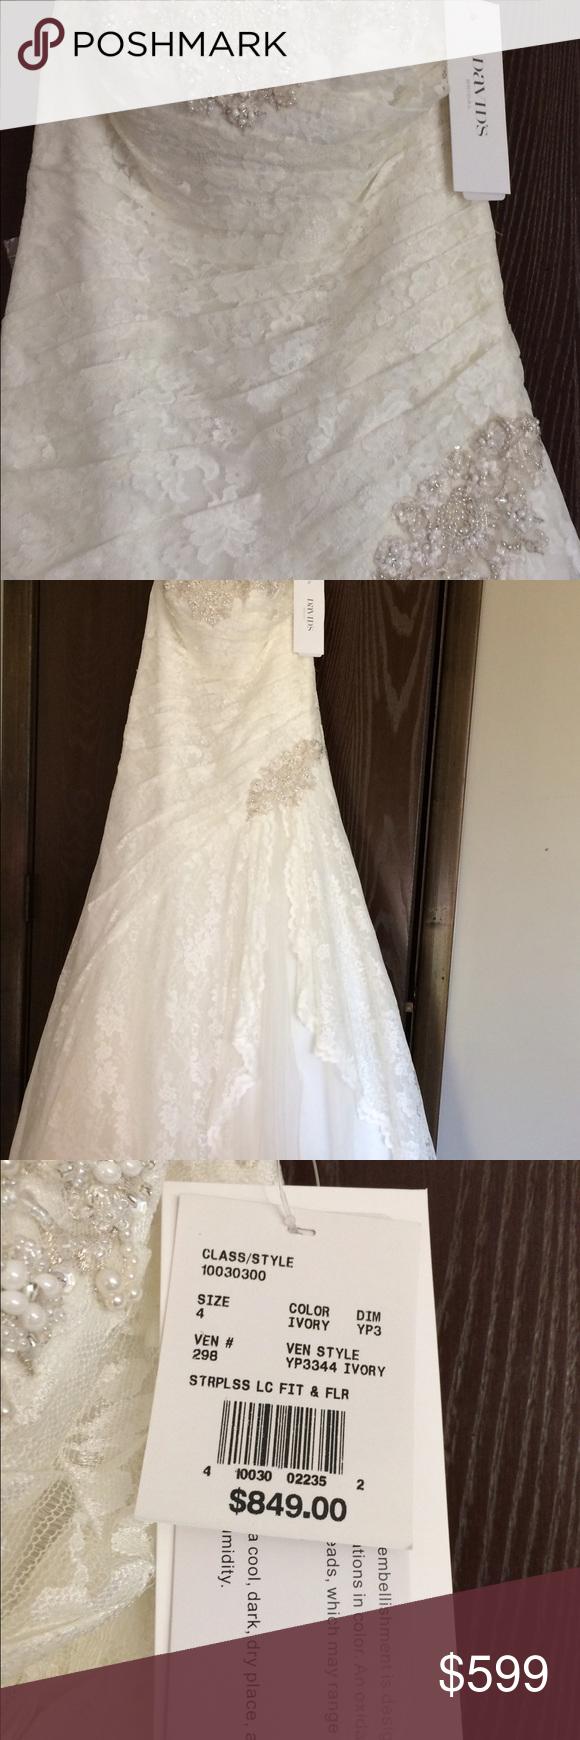 Current design davidus bridal wedding gown never worn never altered